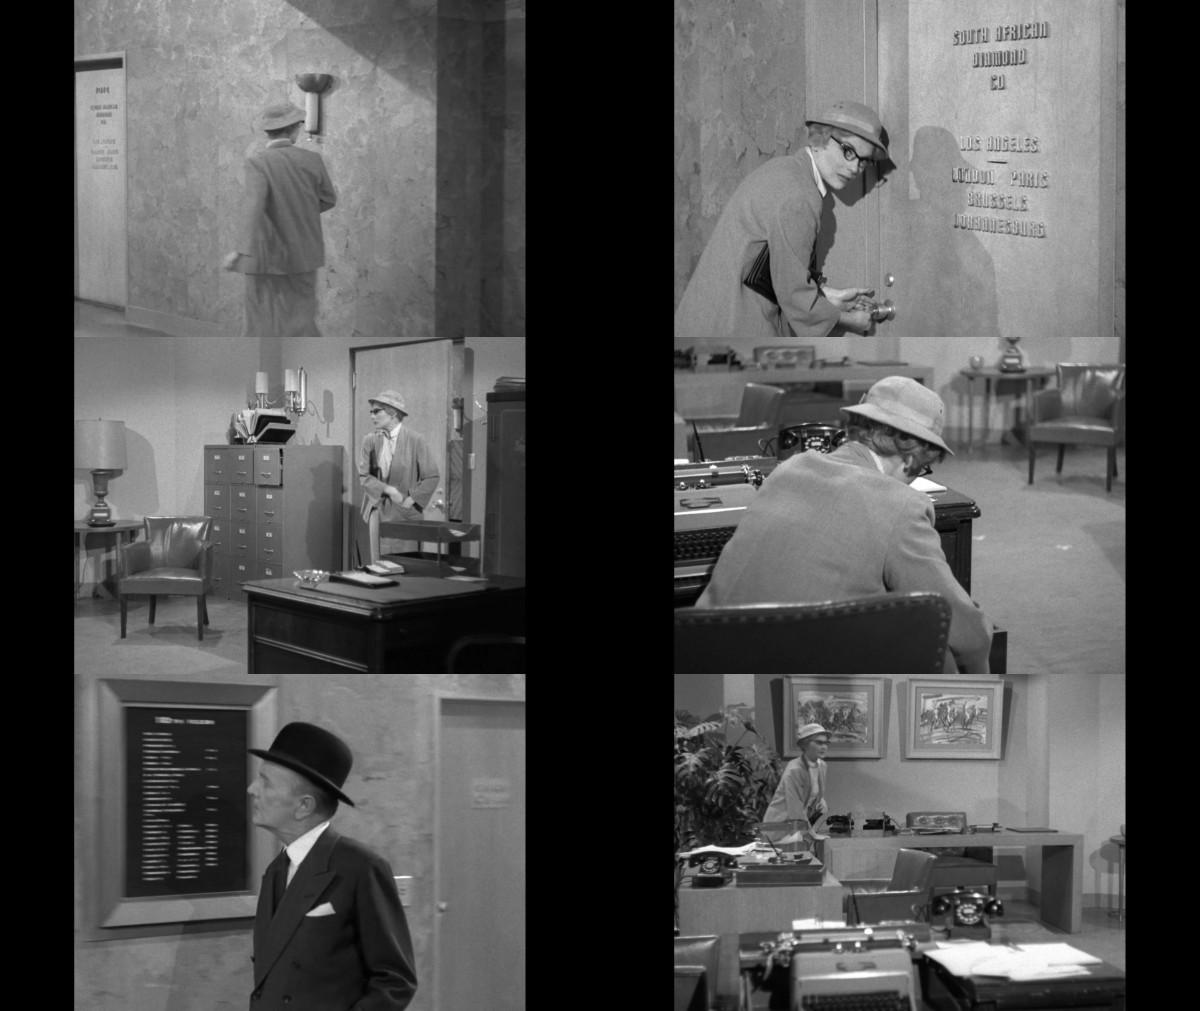 Perry Mason S01E38 1080p WEB h264-DiRT